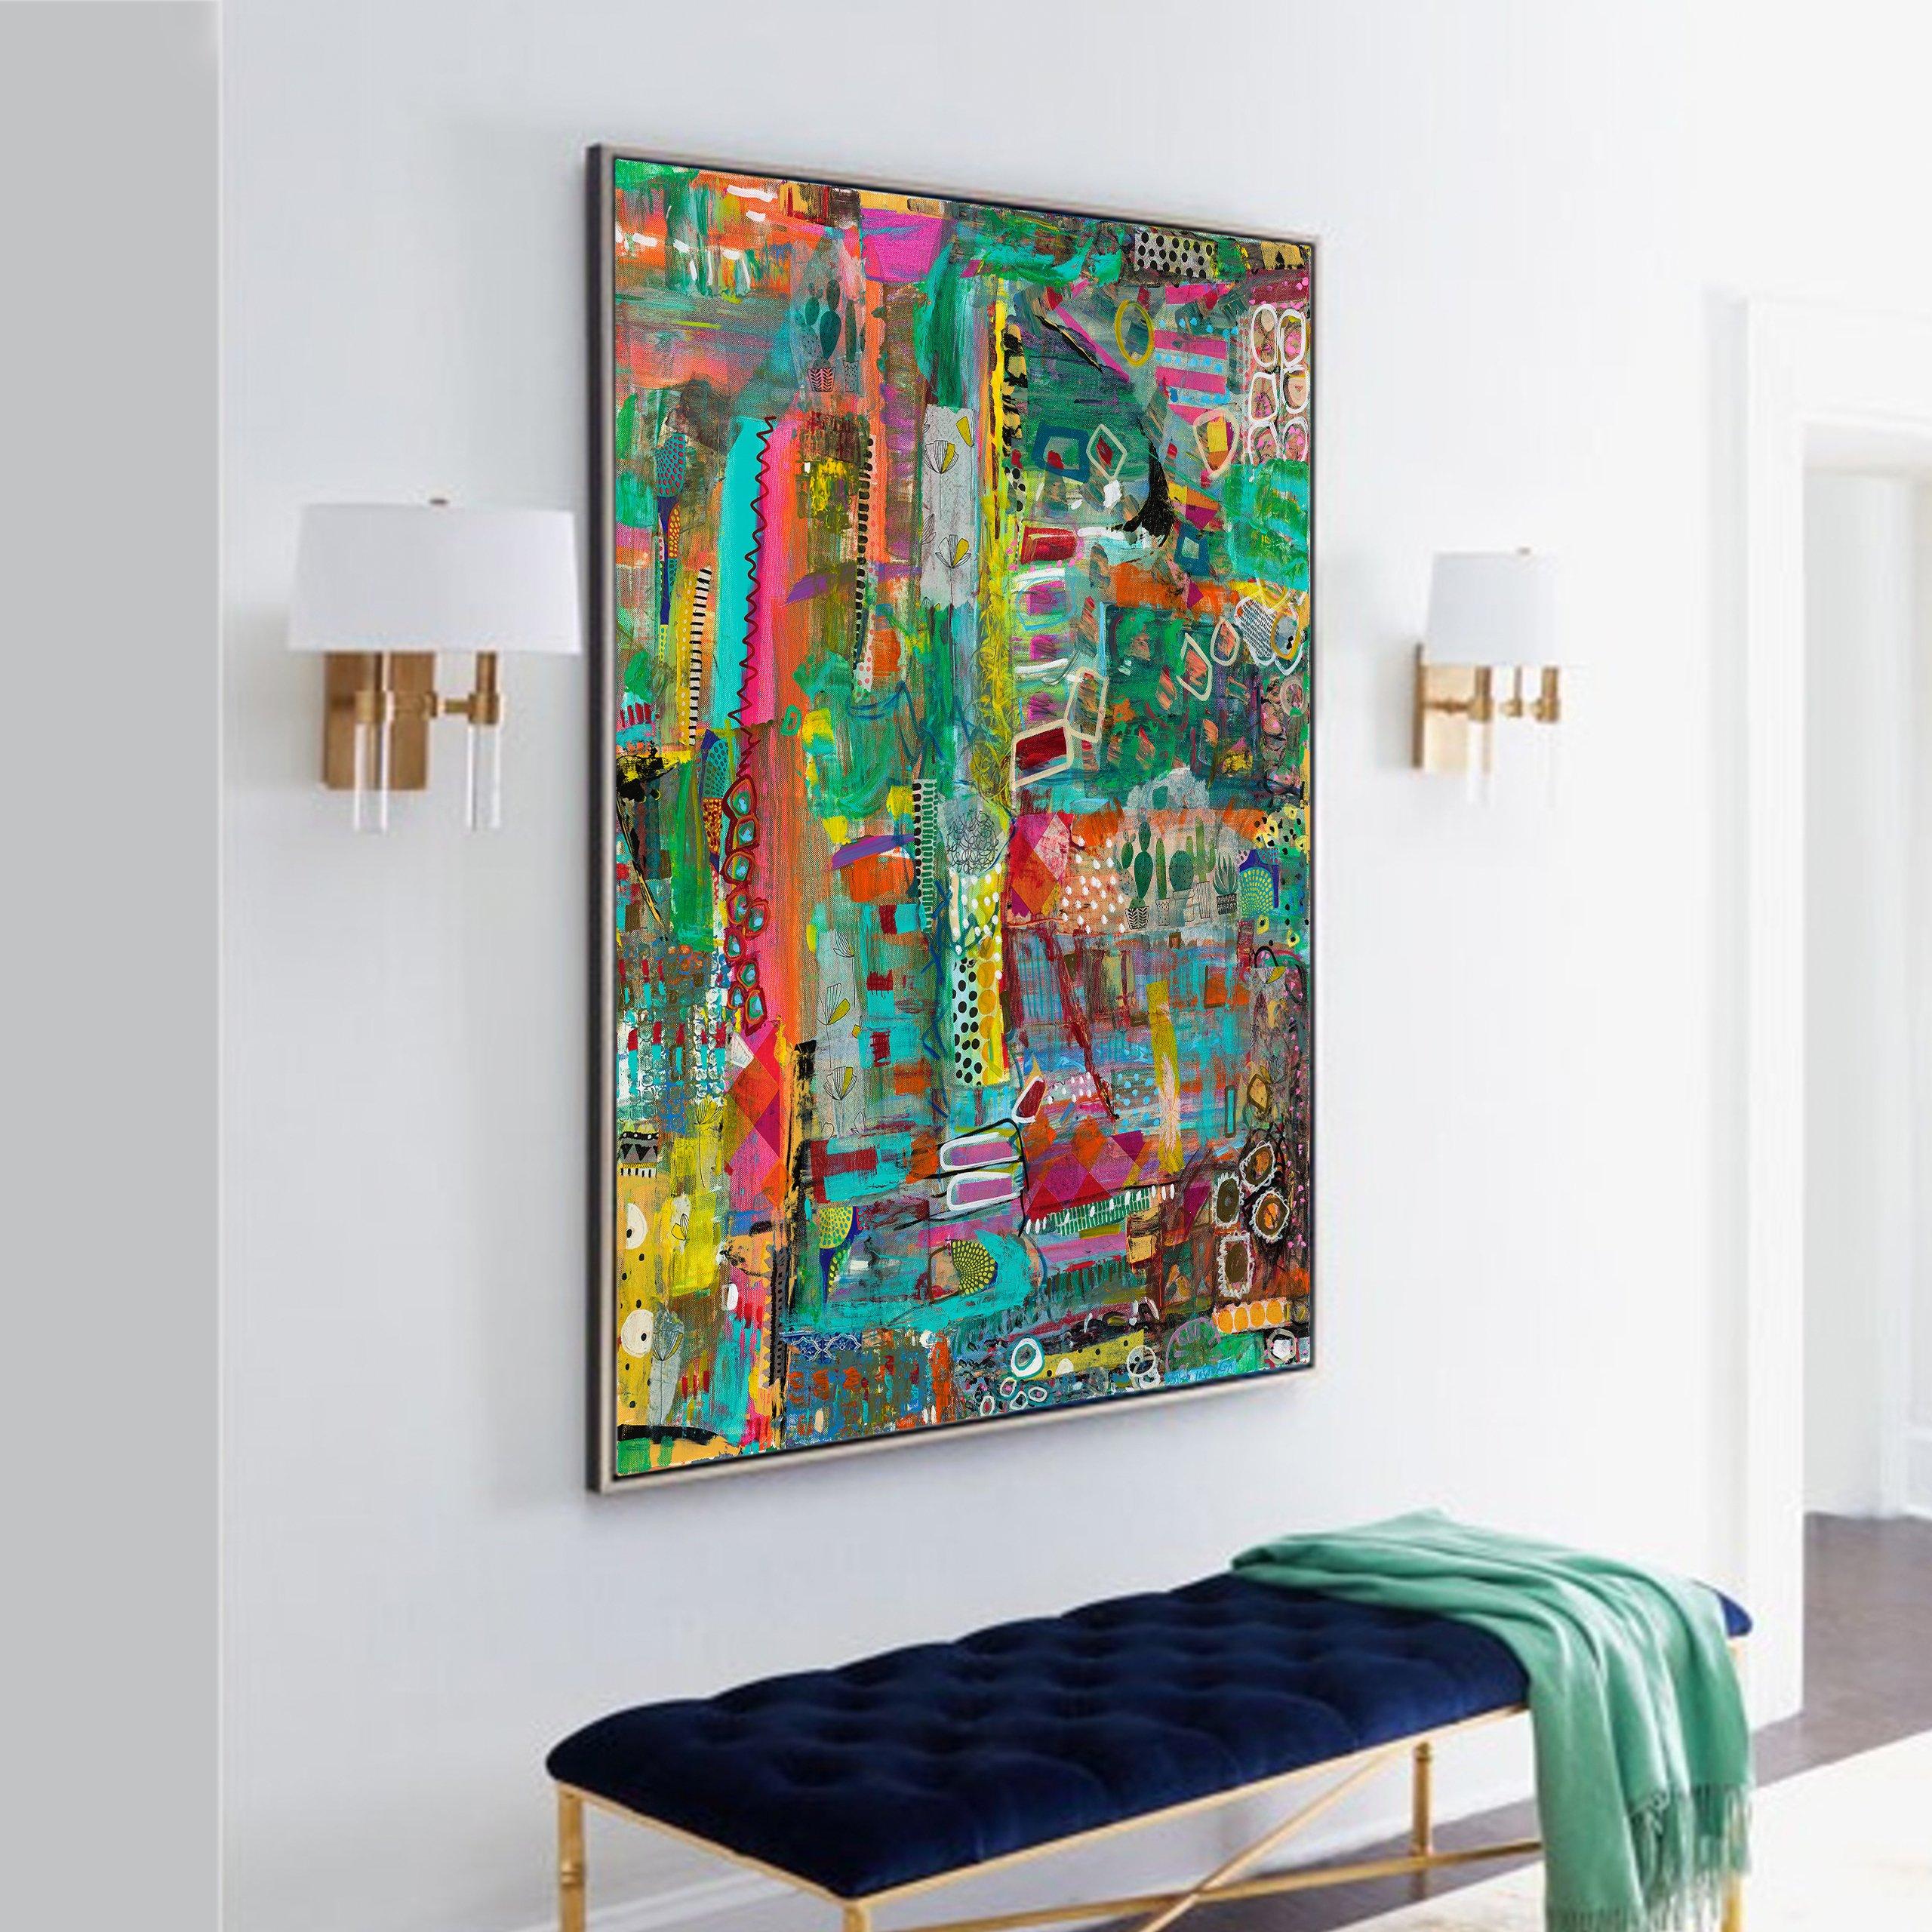 michal-rotman-laor-abstract-art-painting